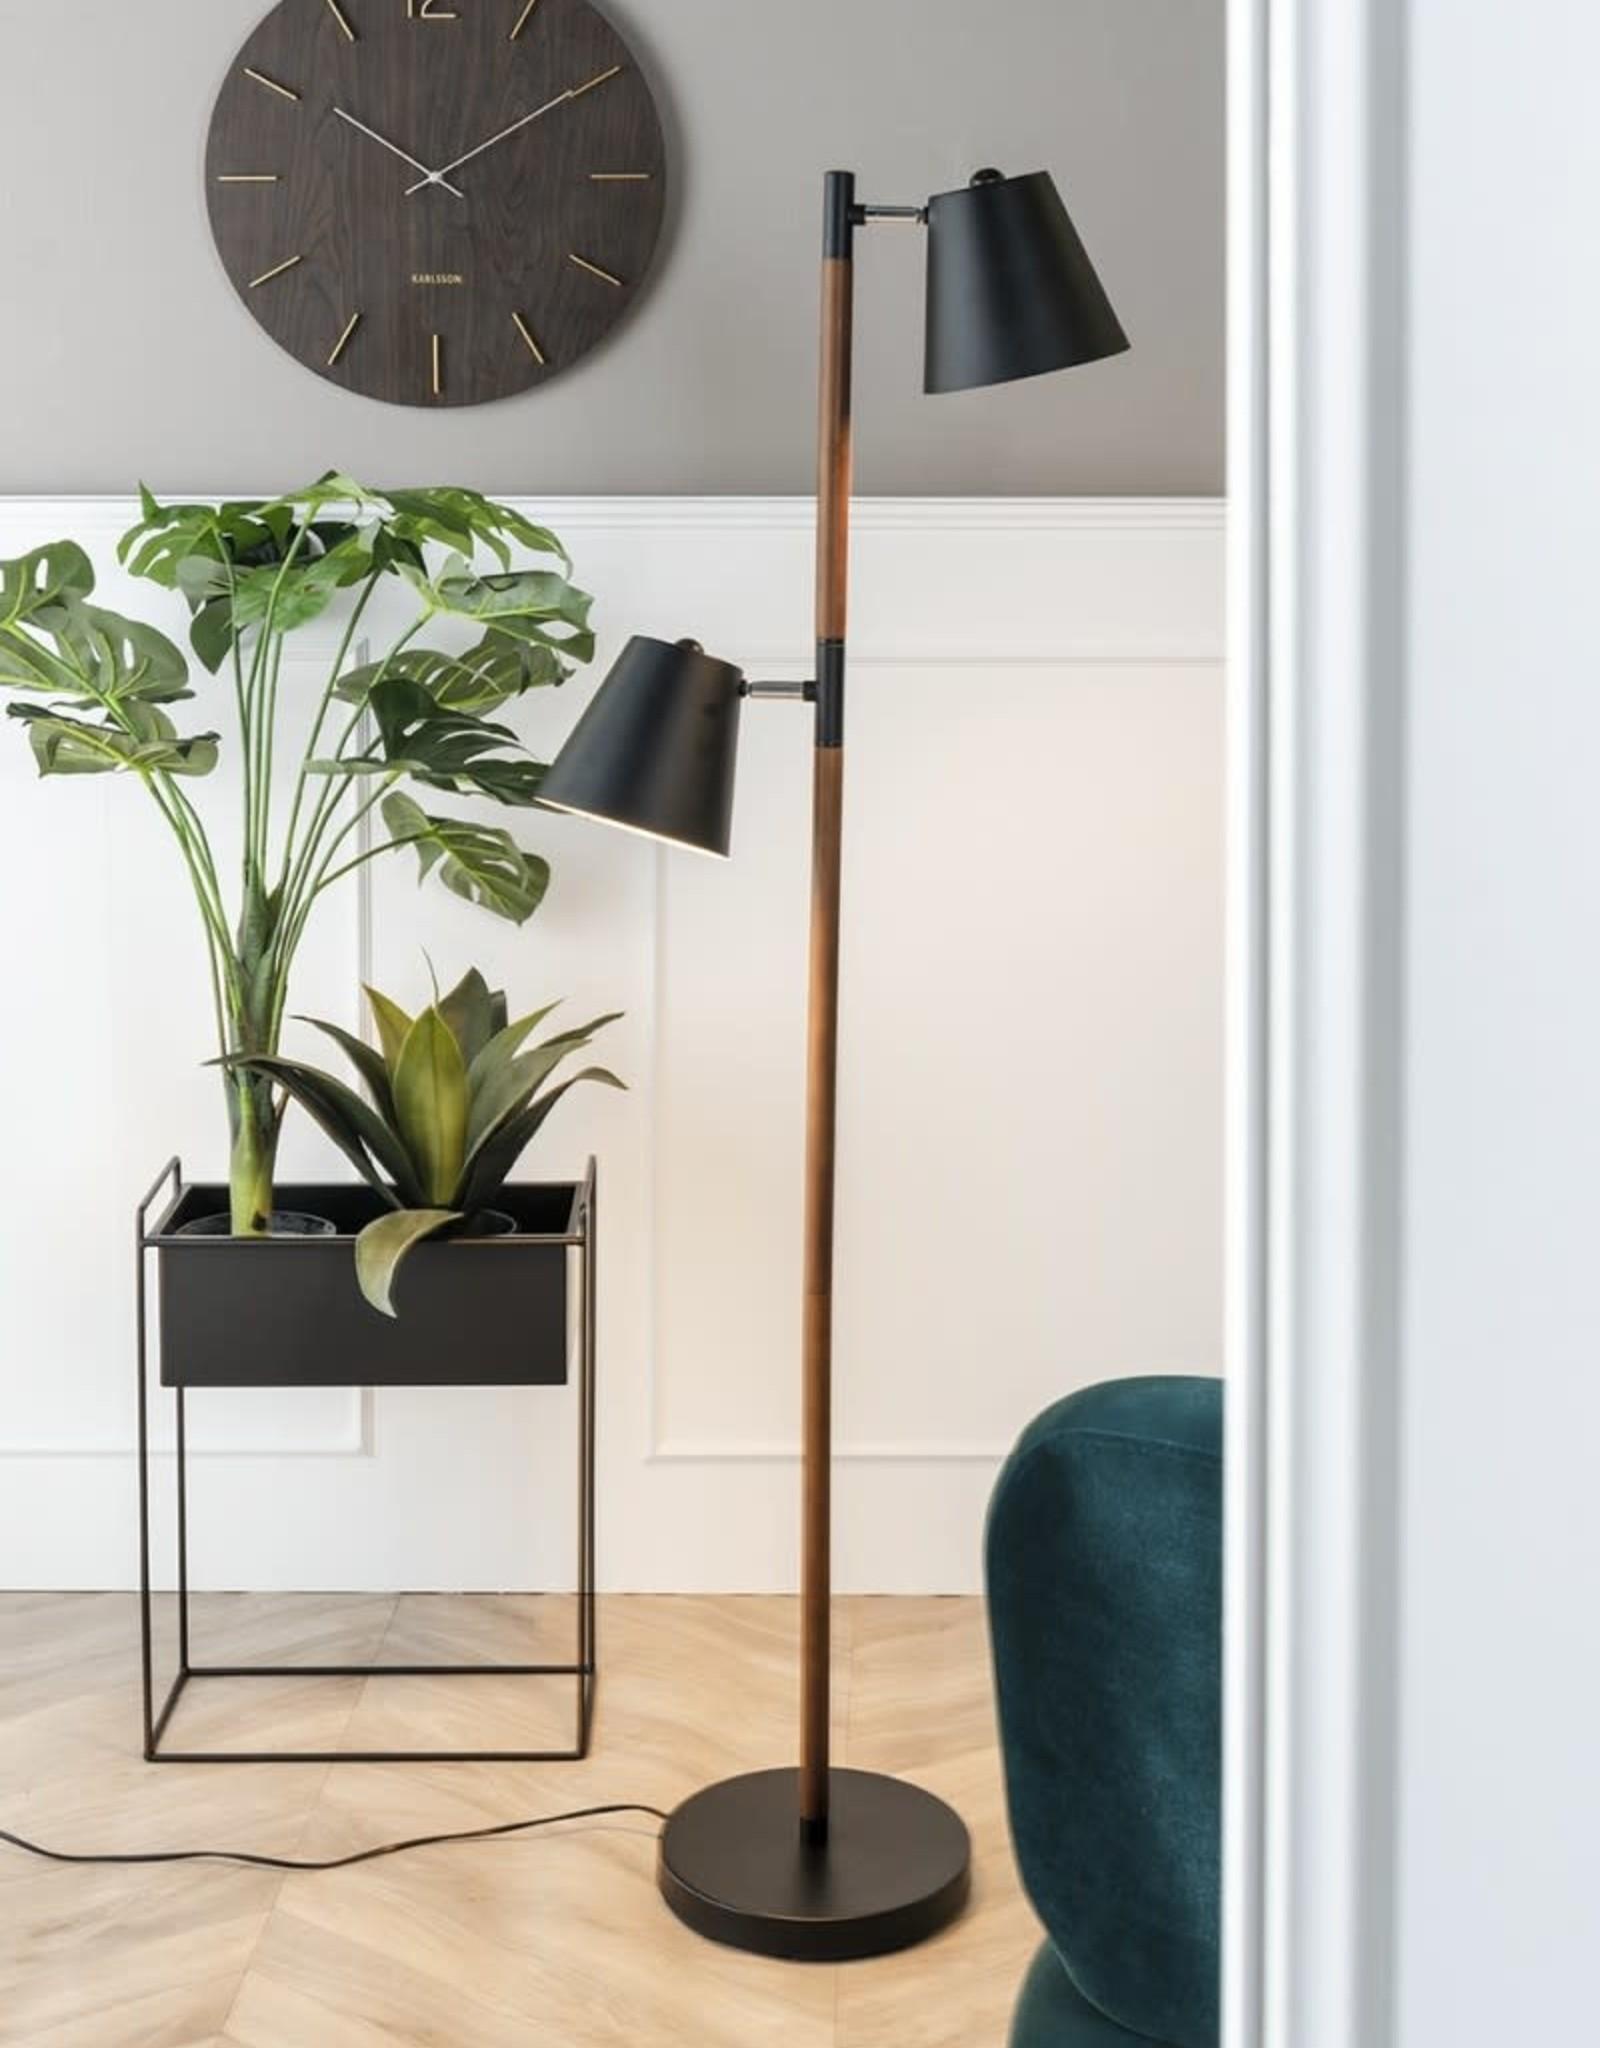 pt Iron planter on stand L [straight] 51 x 24 x 65cm - Black